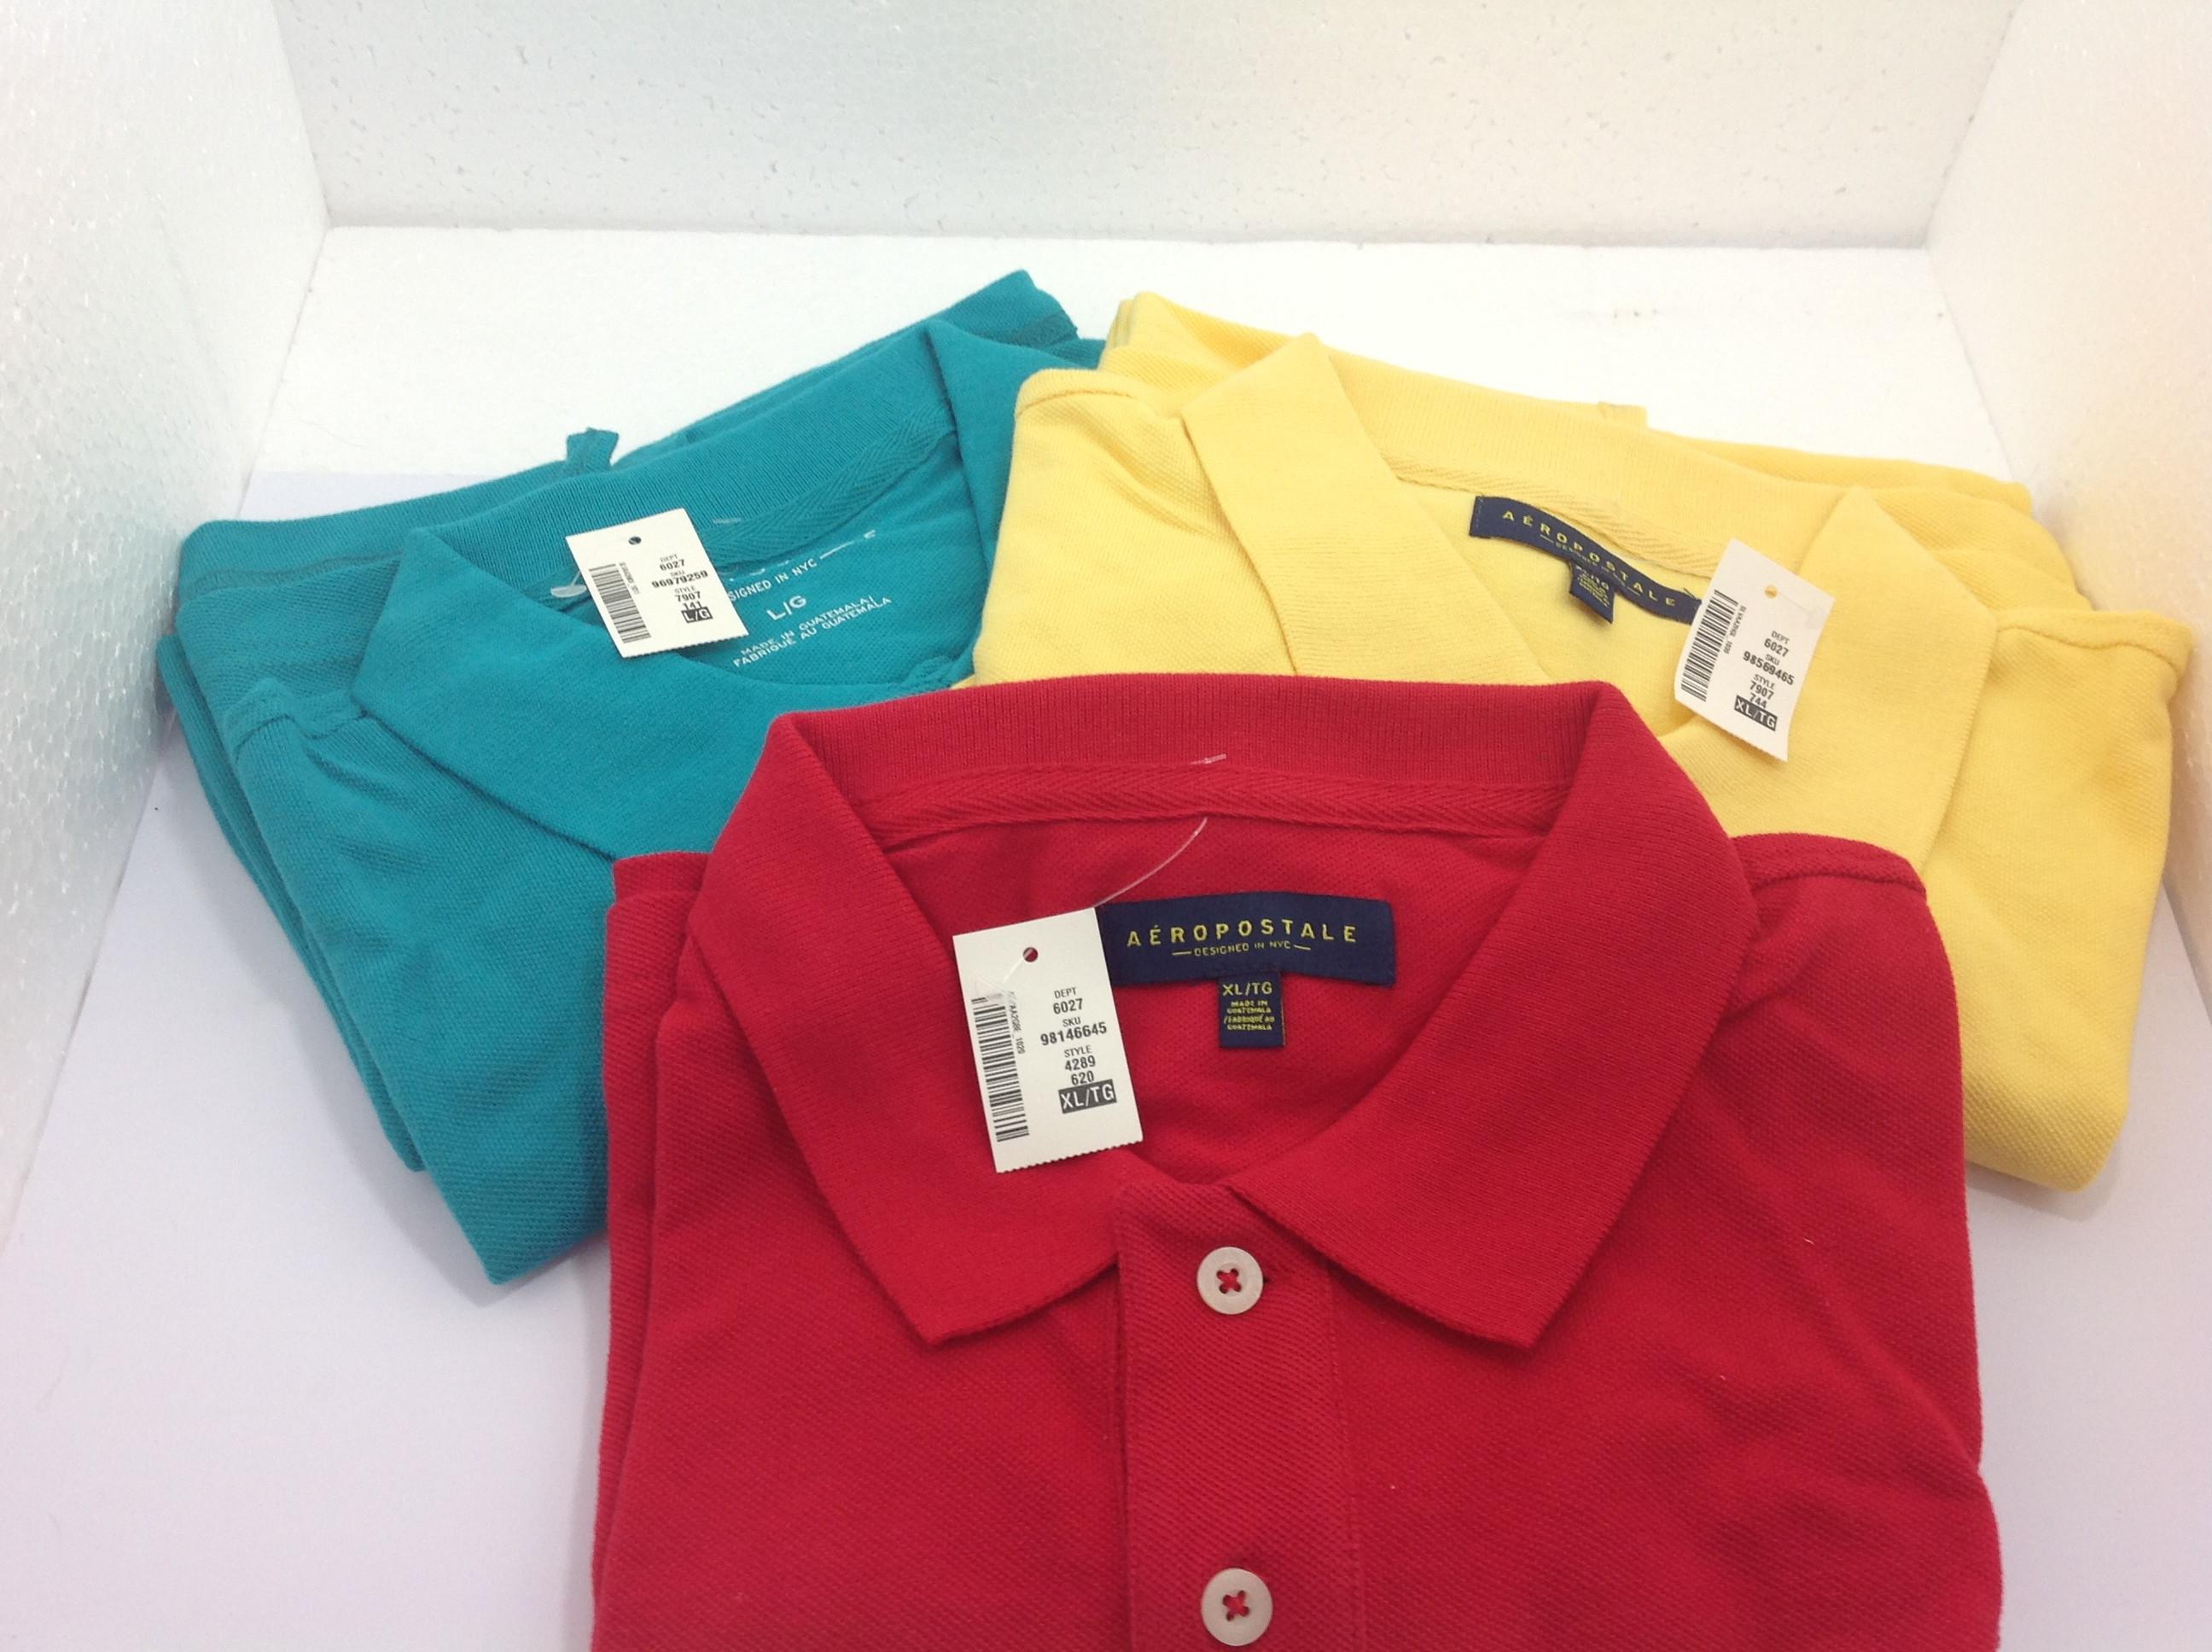 Camisas Aeropostale Original  ff52710d6b203